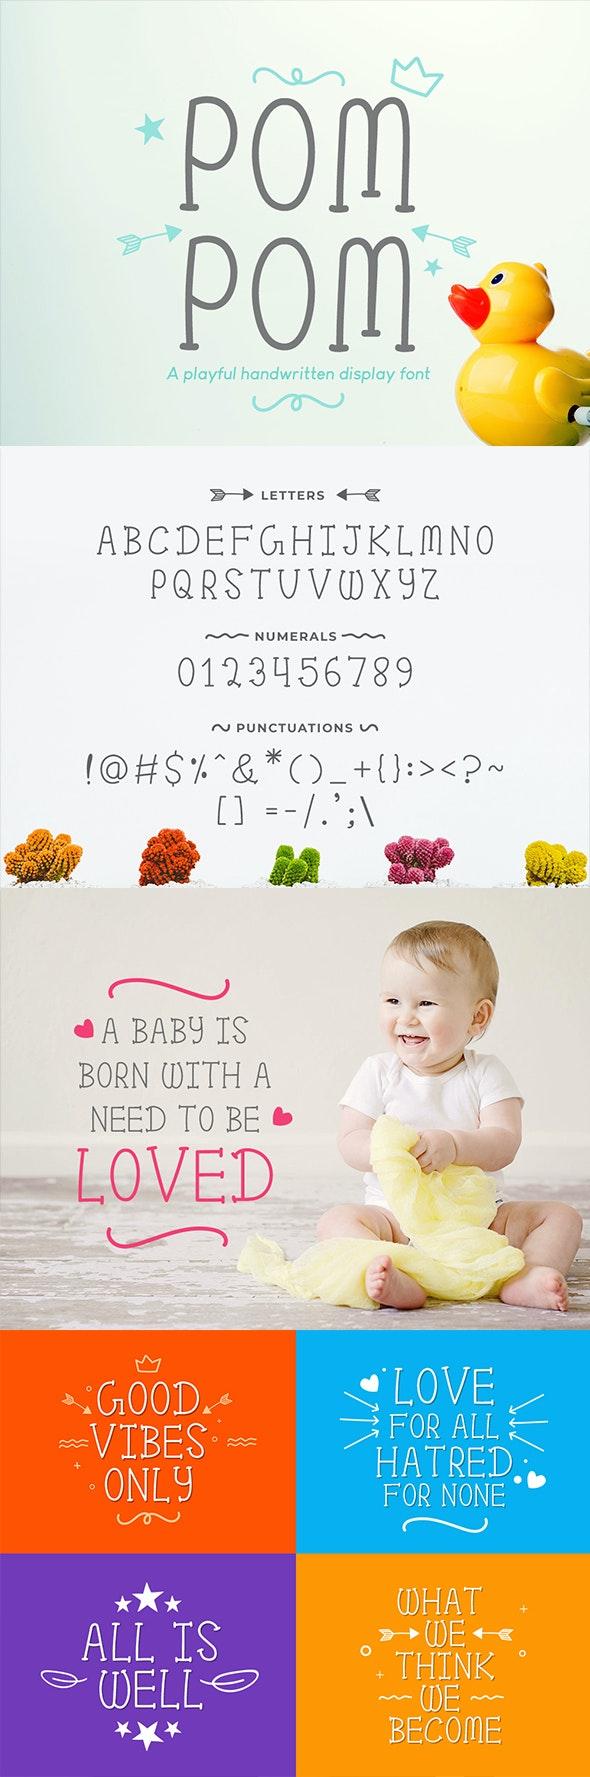 Pom Pom : Cute Handwritten font - Sans-Serif Fonts